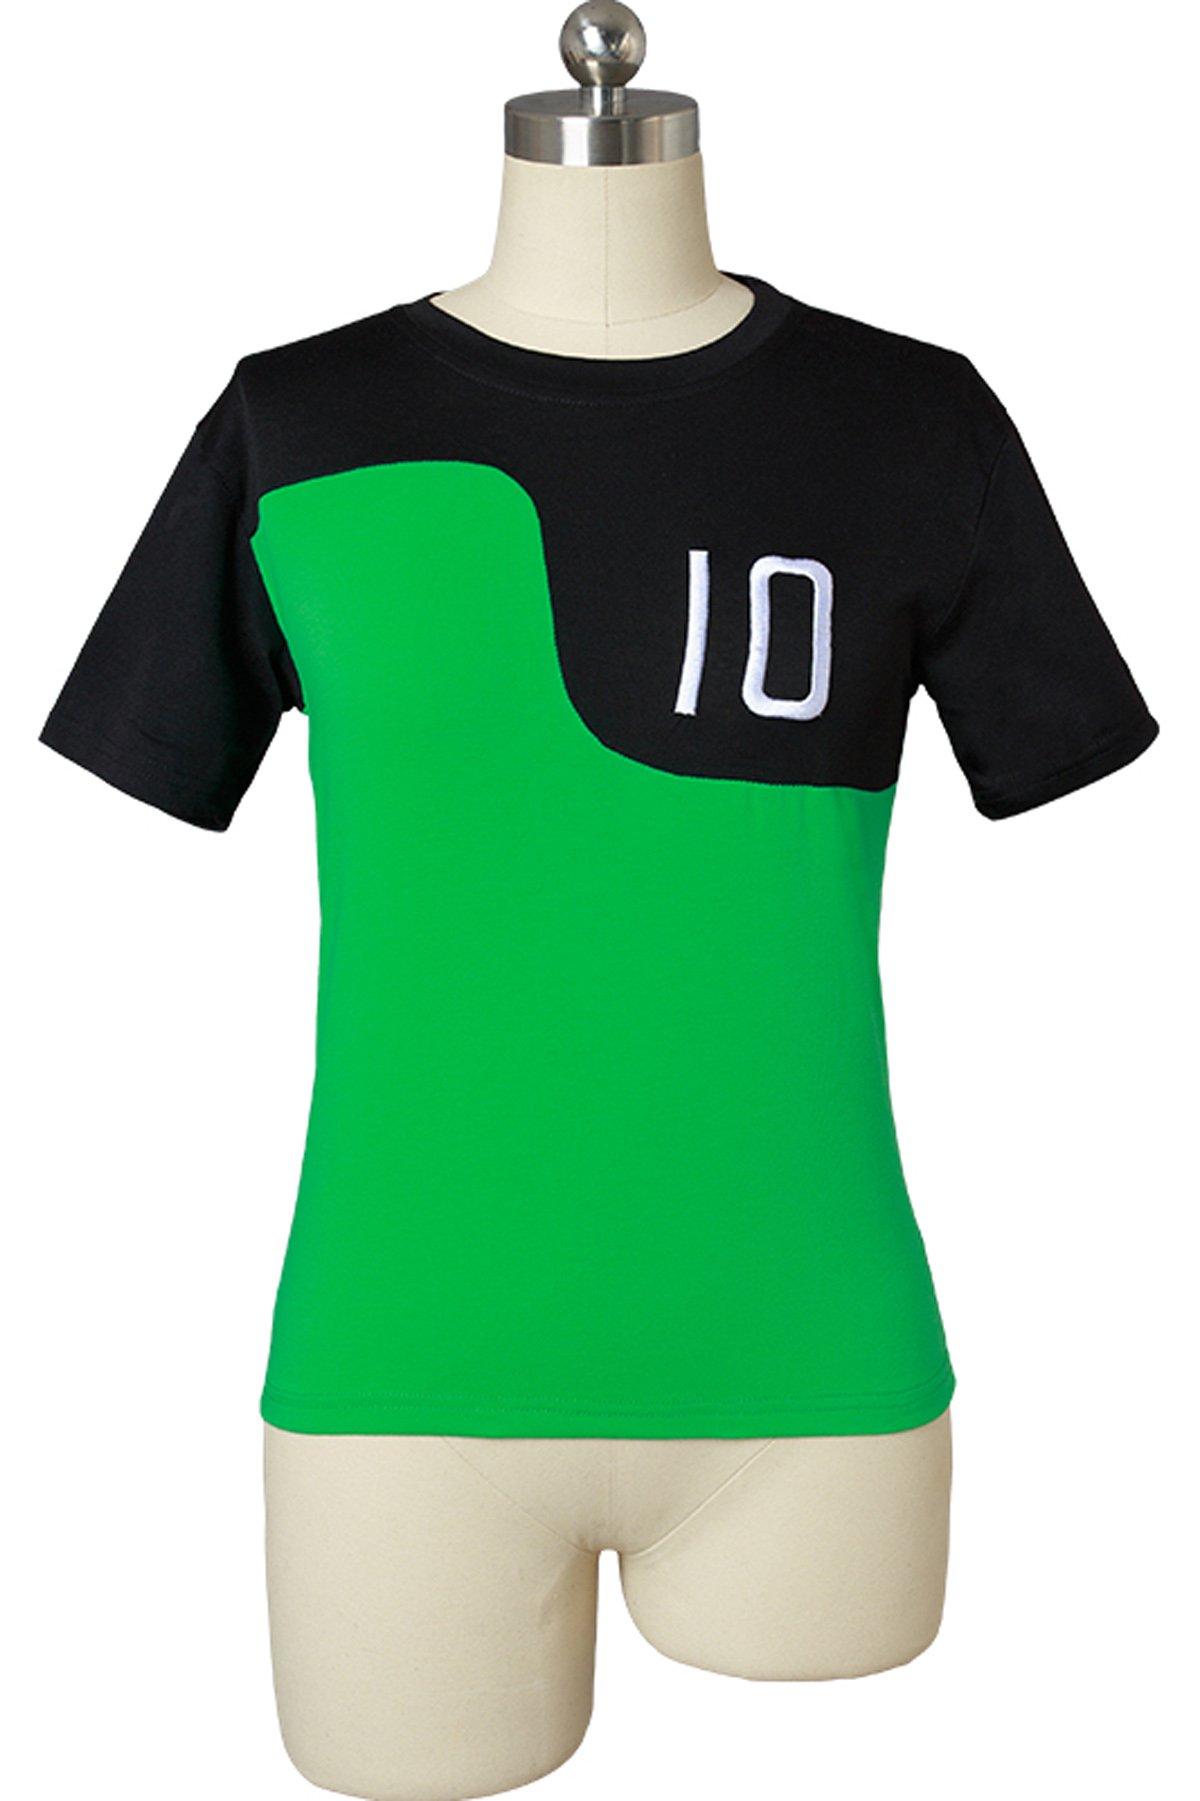 NoveltyBoy Ben 10 Jacket Aliens Force Kids Boys Cosplay Benjamin Irby Tennyson Ten Green Jacket T-Shirt (Age 6-8, T-Shirt)